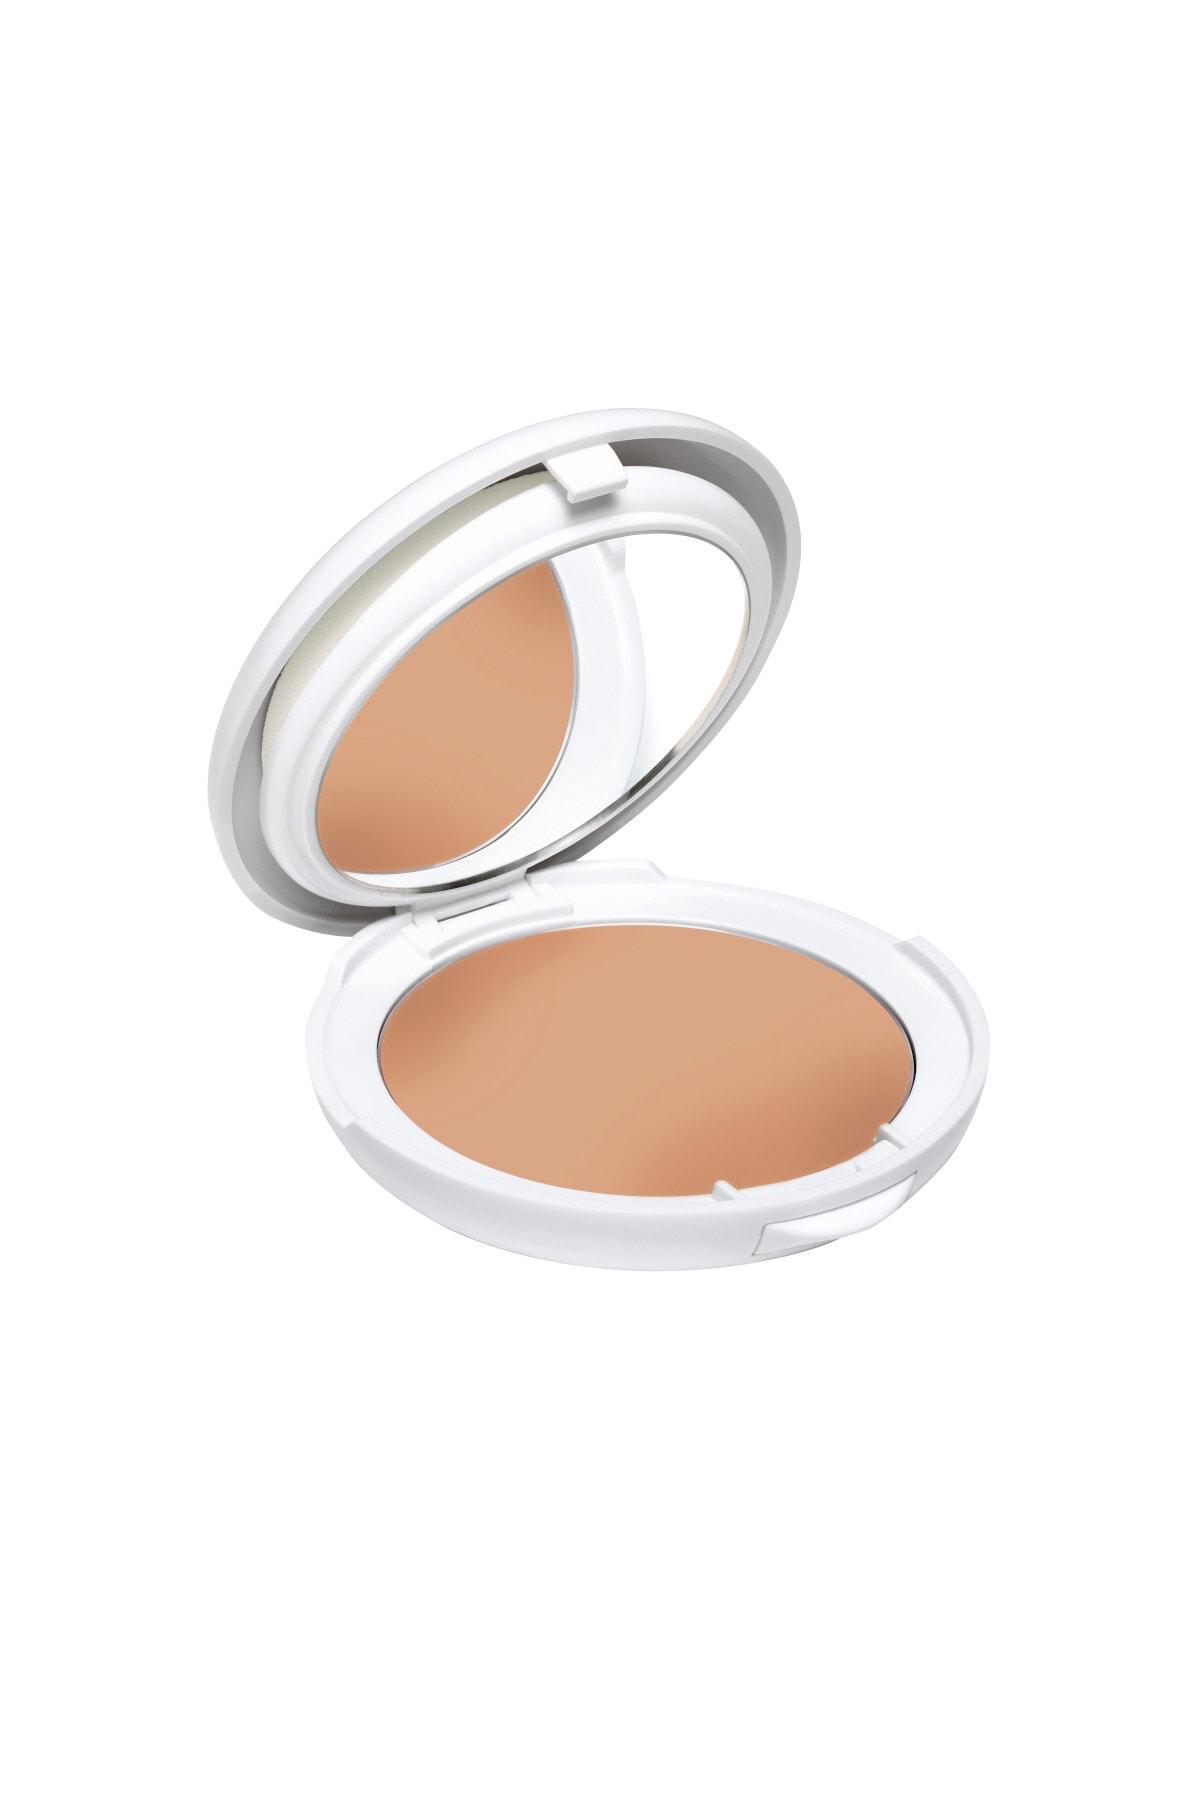 Uriage Bariesun SPF50+ Mineral Cream Tinted Compact Golden Tint 10 g 3661434007187